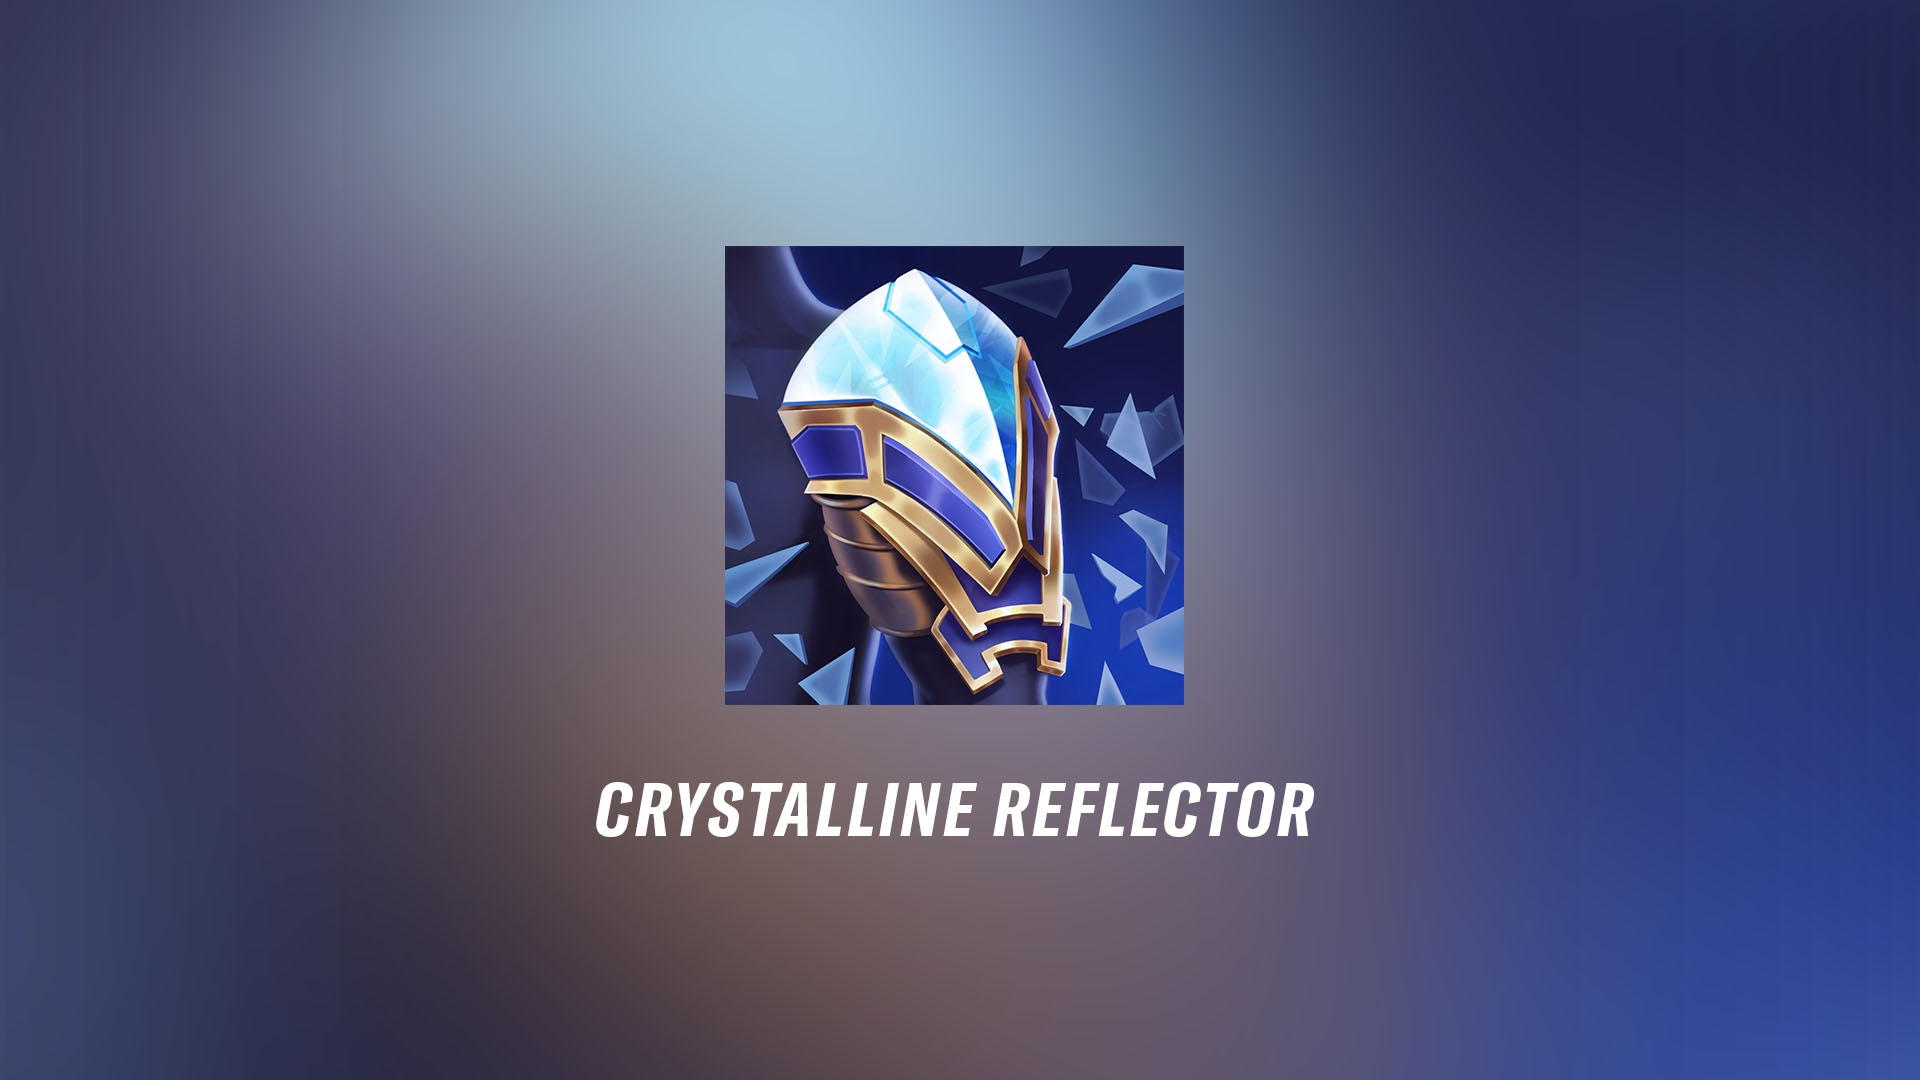 07272021_WRPatchNotes24_CrystallineReflector.jpg